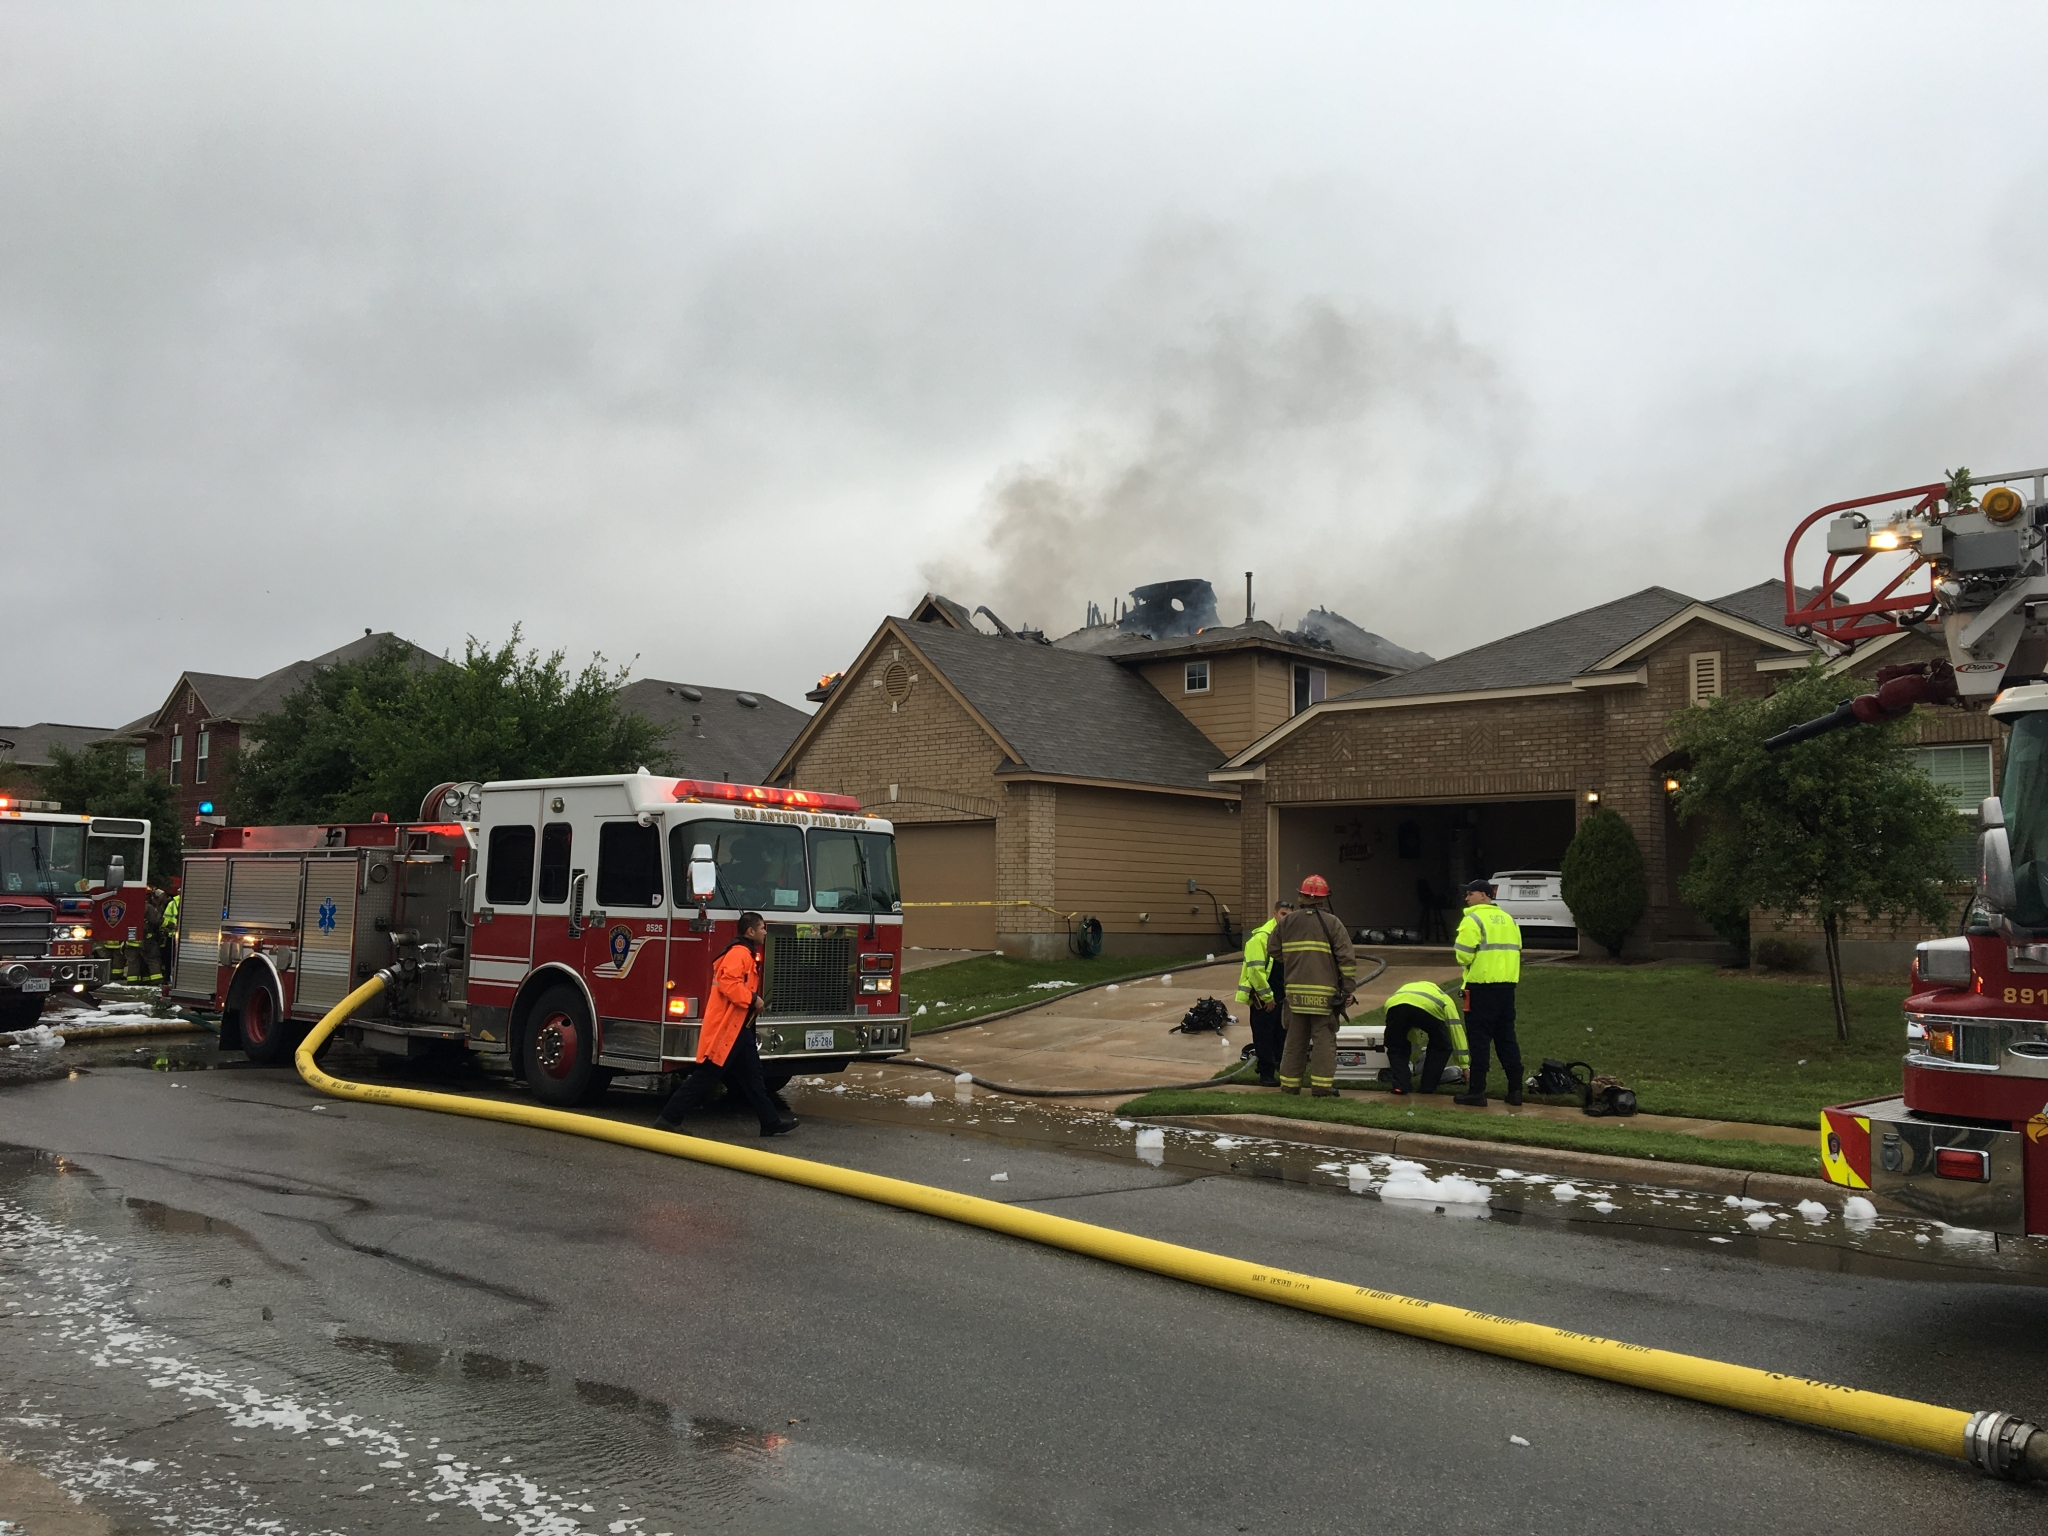 lightning strike suspected in house fire on far west side